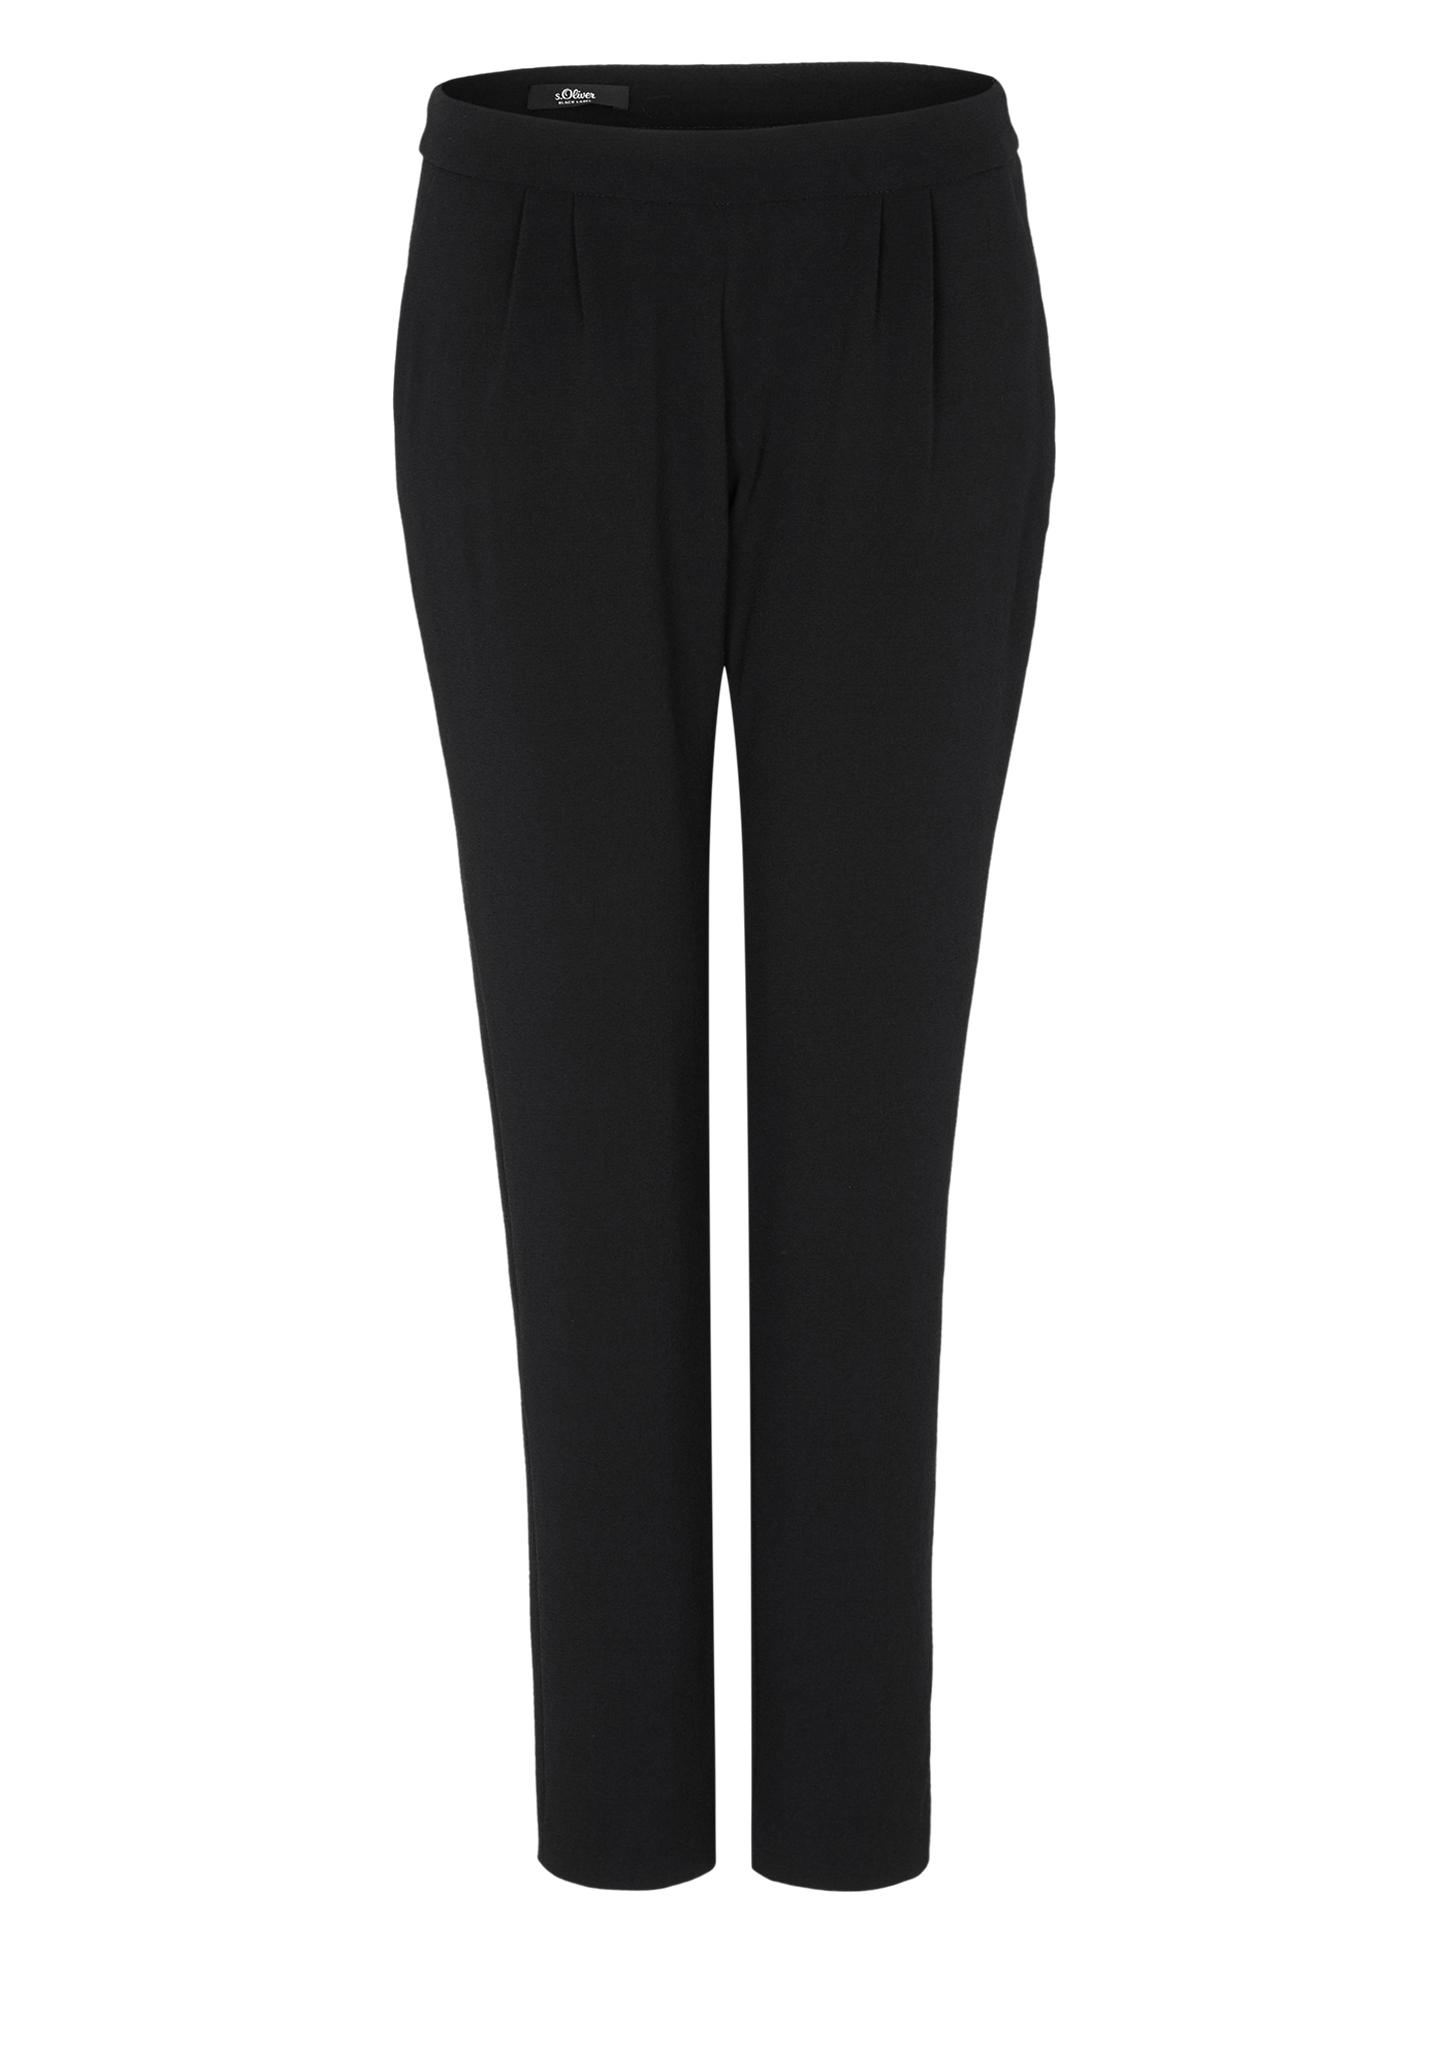 Bundfaltenhose | Bekleidung > Hosen > Bundfaltenhosen | Grau/schwarz | Obermaterial 97% polyester -  3% elasthan| futter 100% acetat | s.Oliver BLACK LABEL